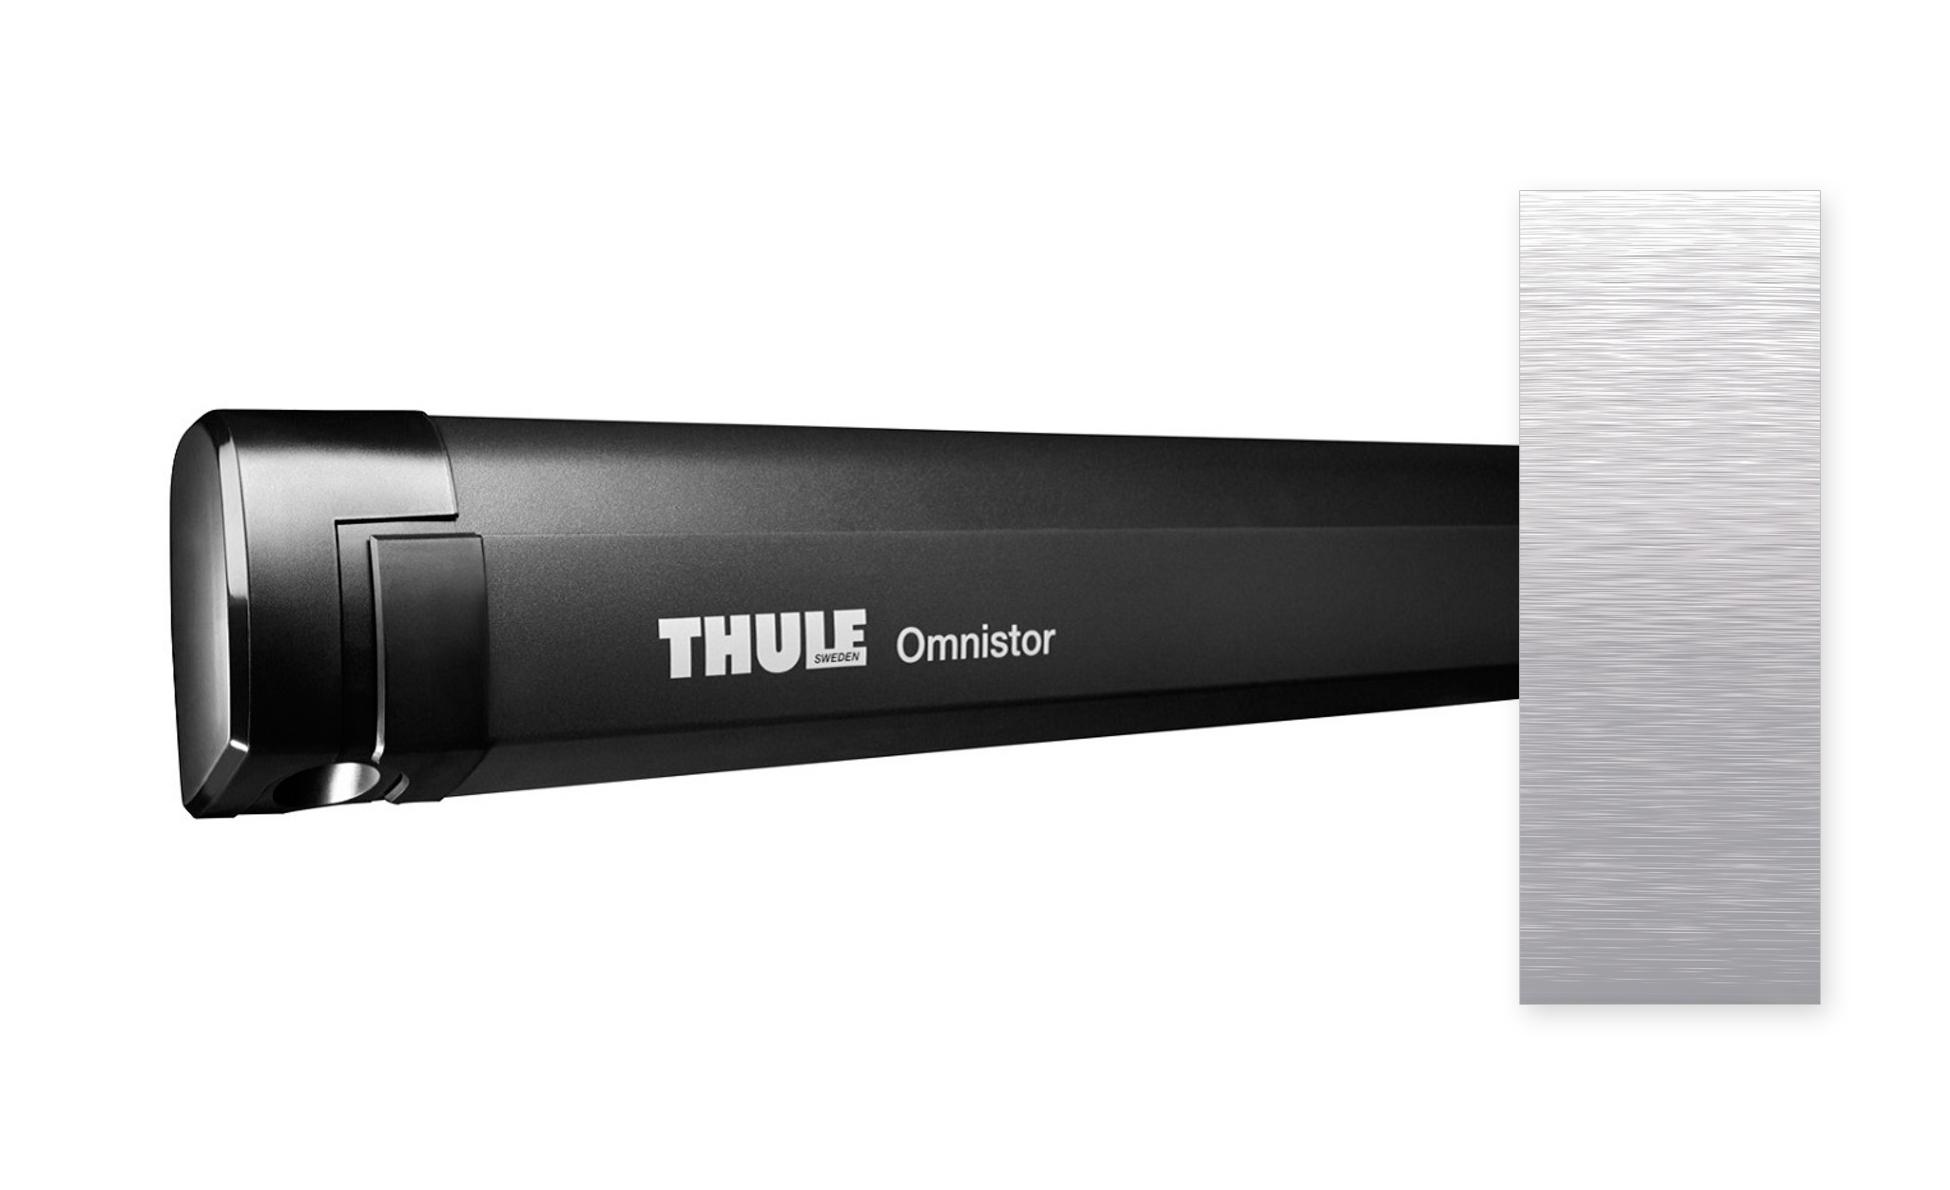 Thule Omnistor 5200 anthrazit 260x200 cm, Mystic Grau